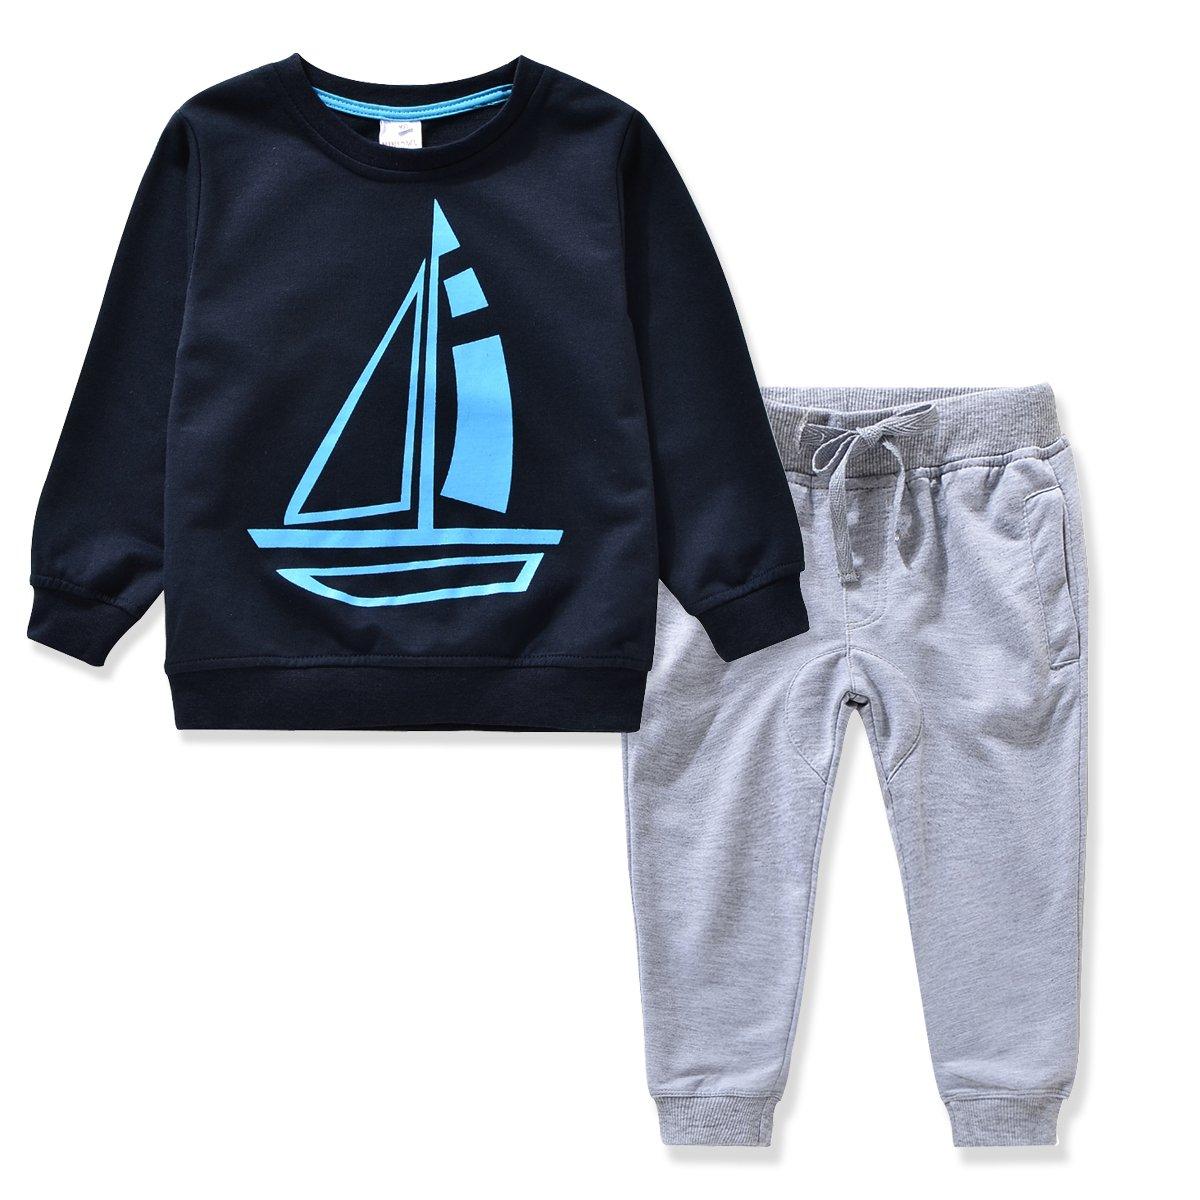 Miniowl Kids Boys Clothing Sets Ship Pattern Long Sleeve T-shirt Pants DB 2T